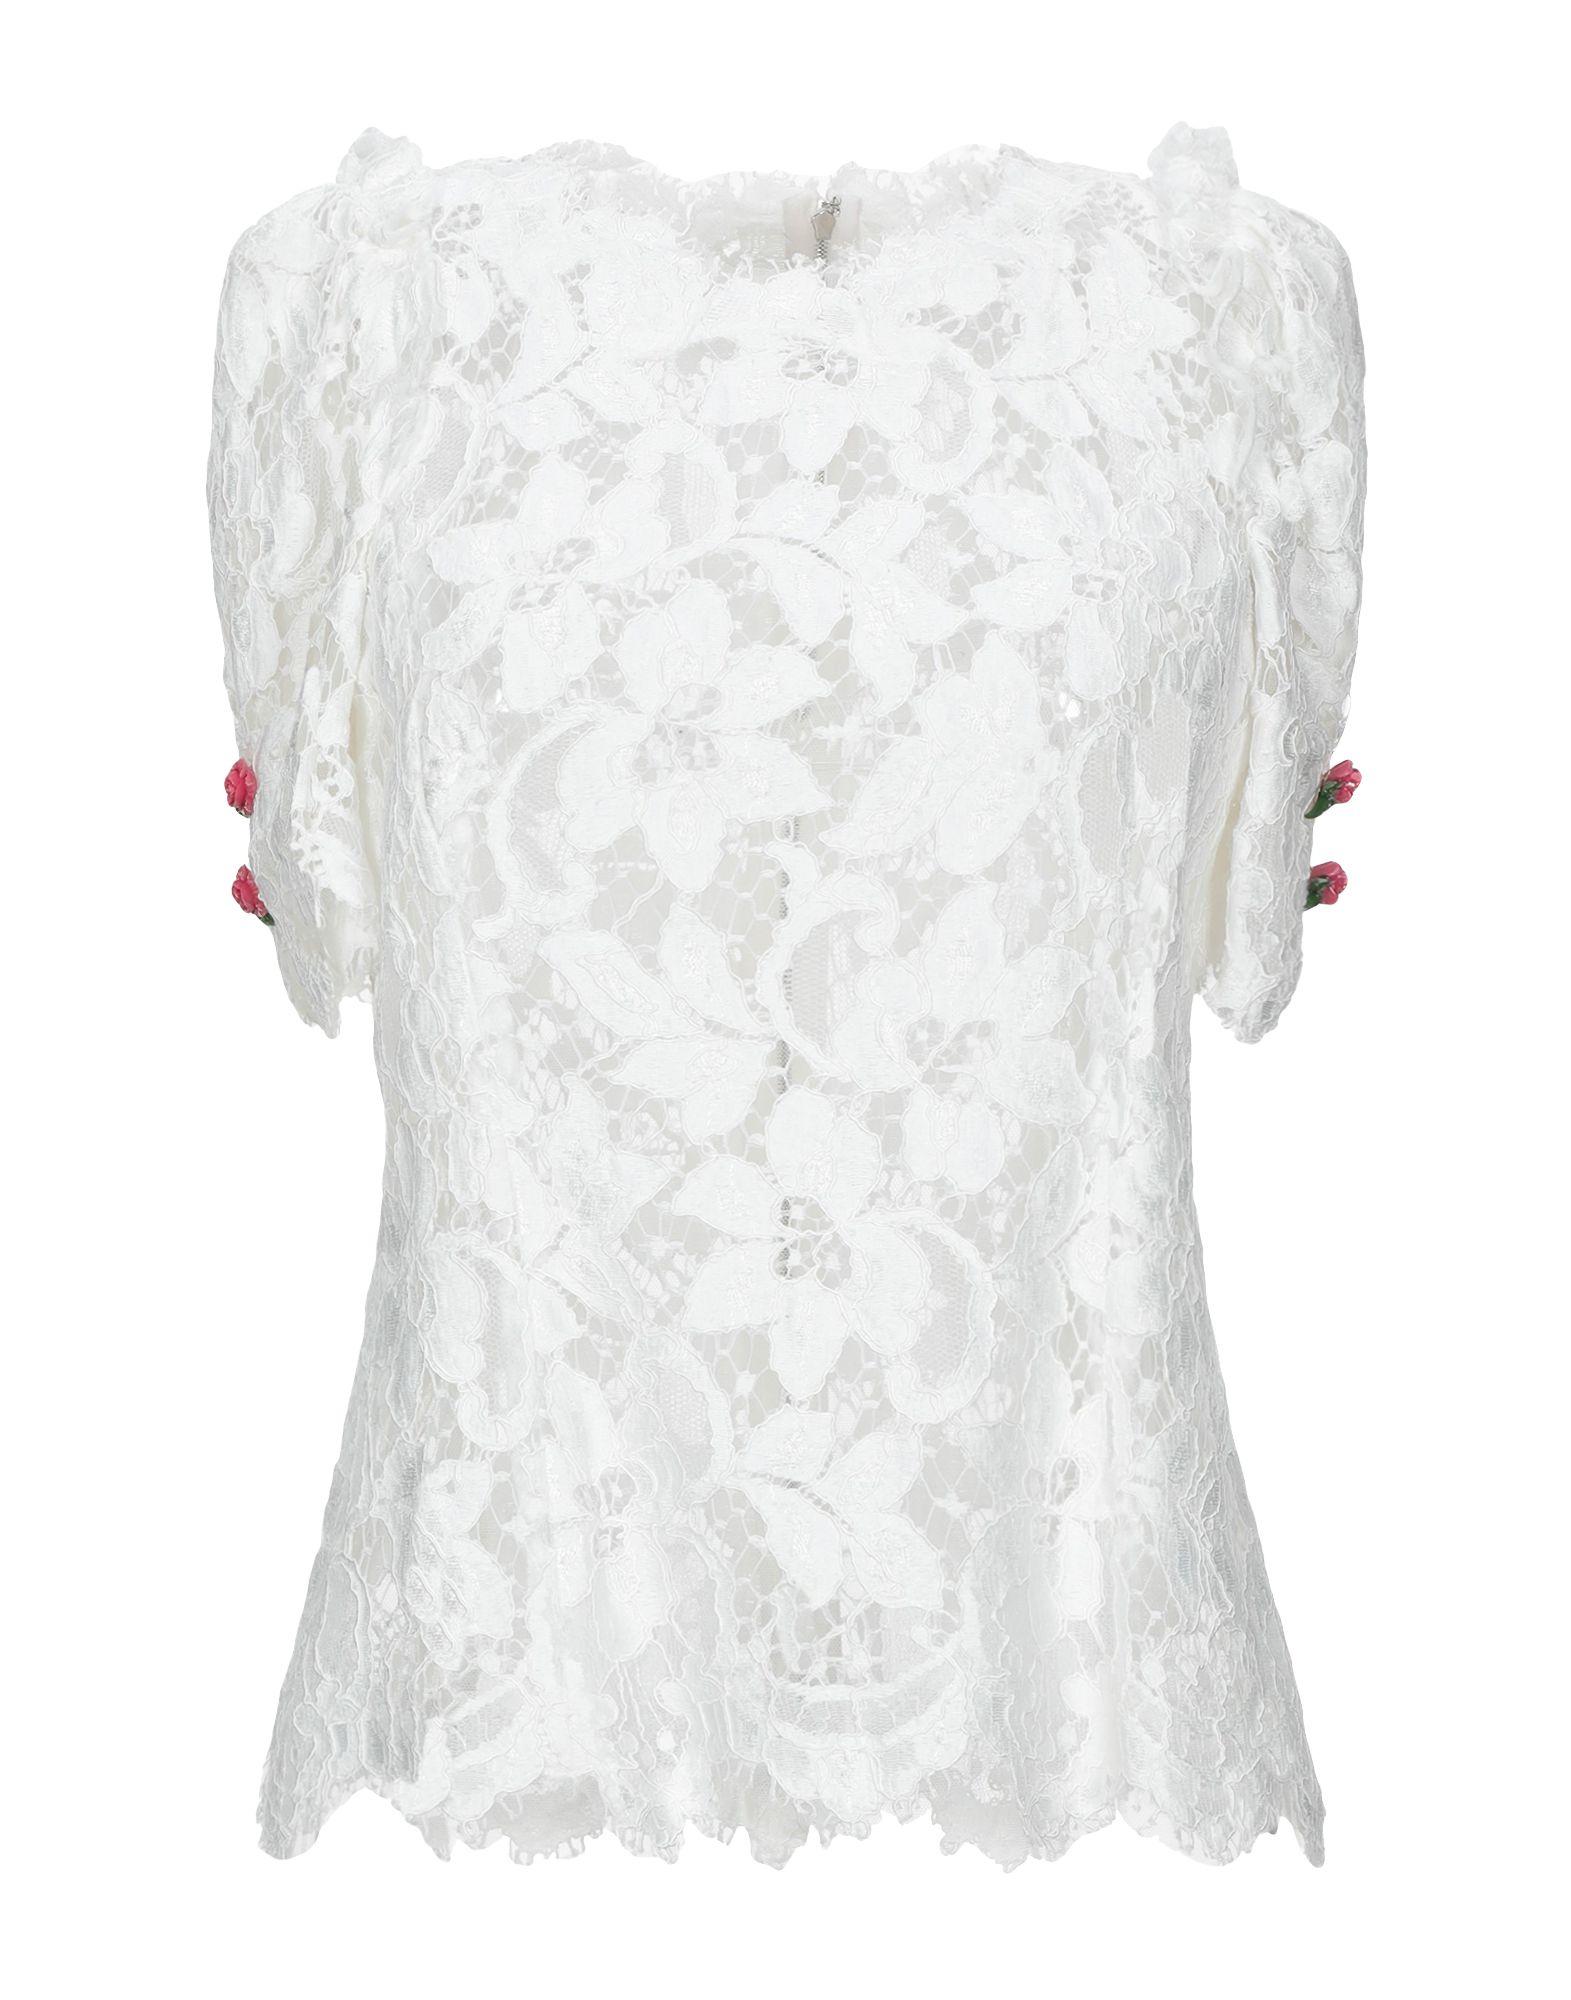 Фото - DOLCE & GABBANA Блузка блузка dolce